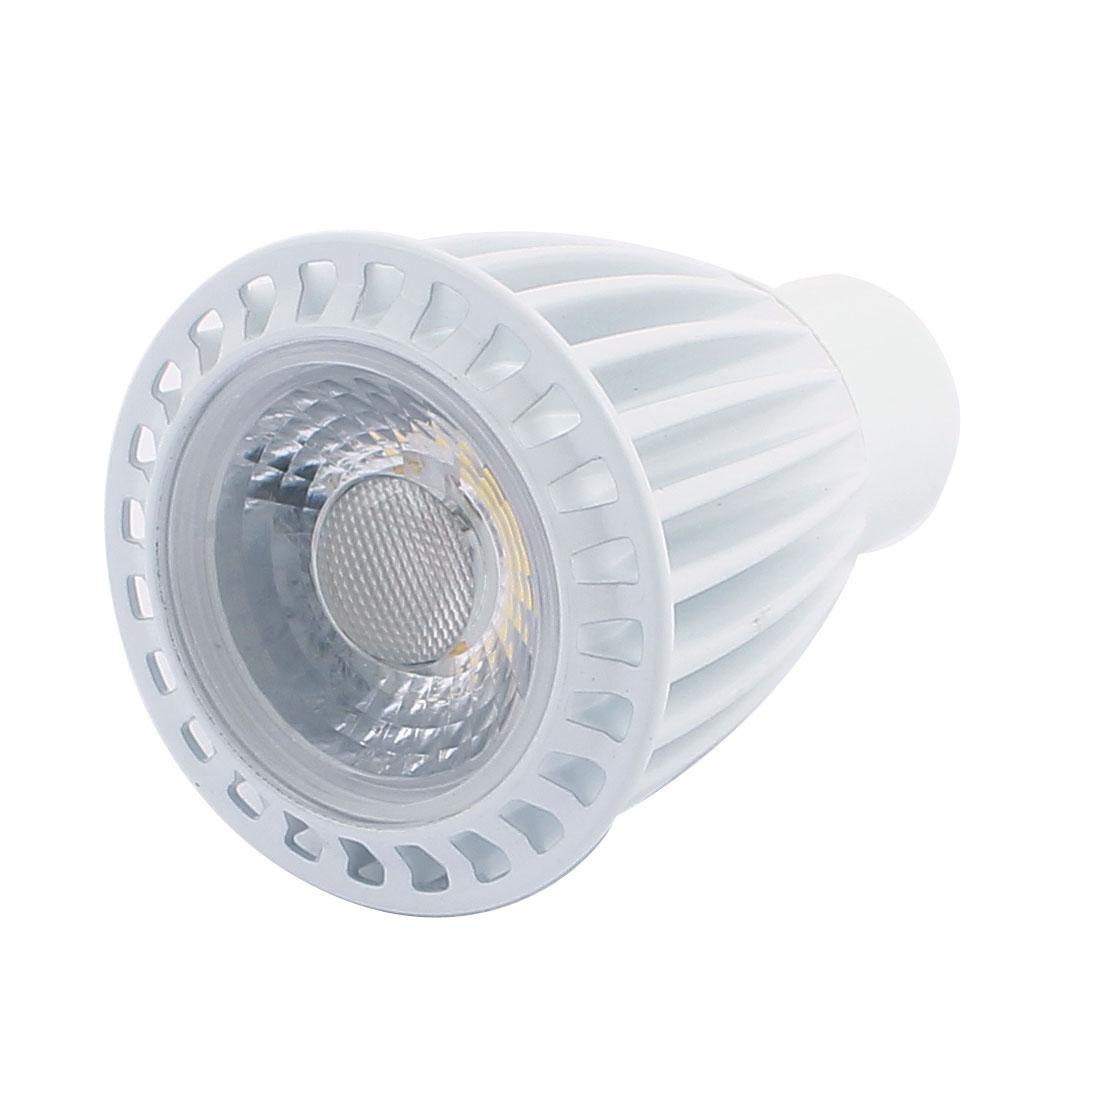 AC85-265V 7W GU5.3 COB Integrated Chip LED Spotlight Lamp Bulb Downlight Pure White